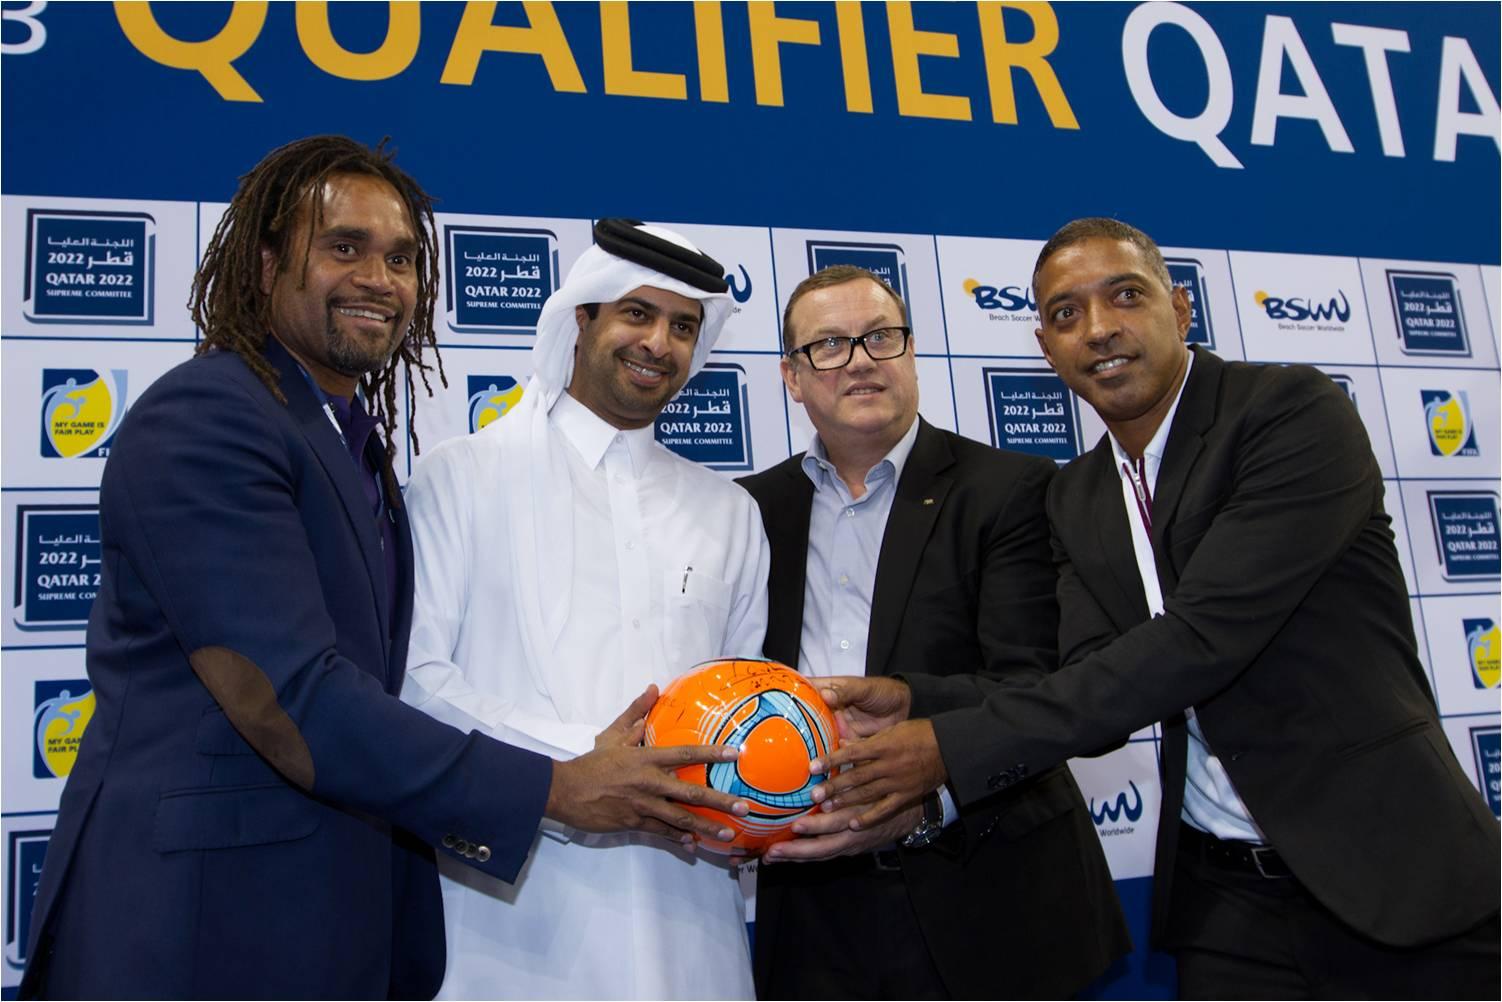 Qatar to host FIFA Beach Soccer World Cup